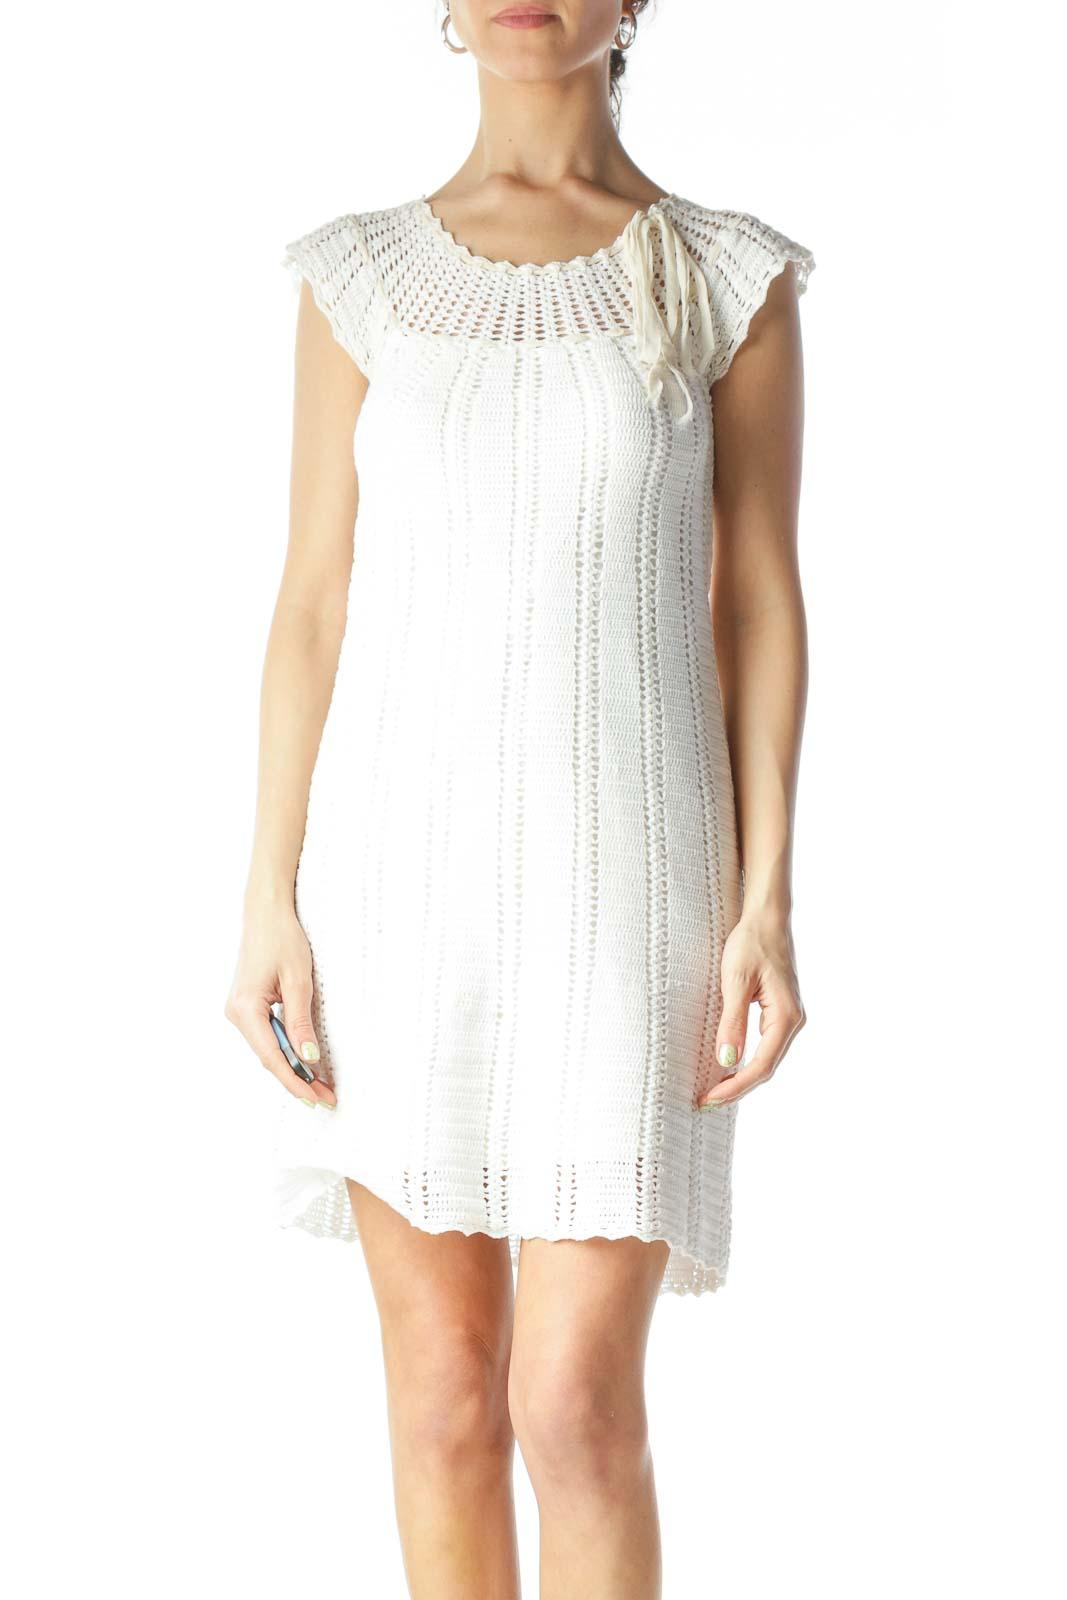 Cream Round Neck Crocheted Body Knit Dress